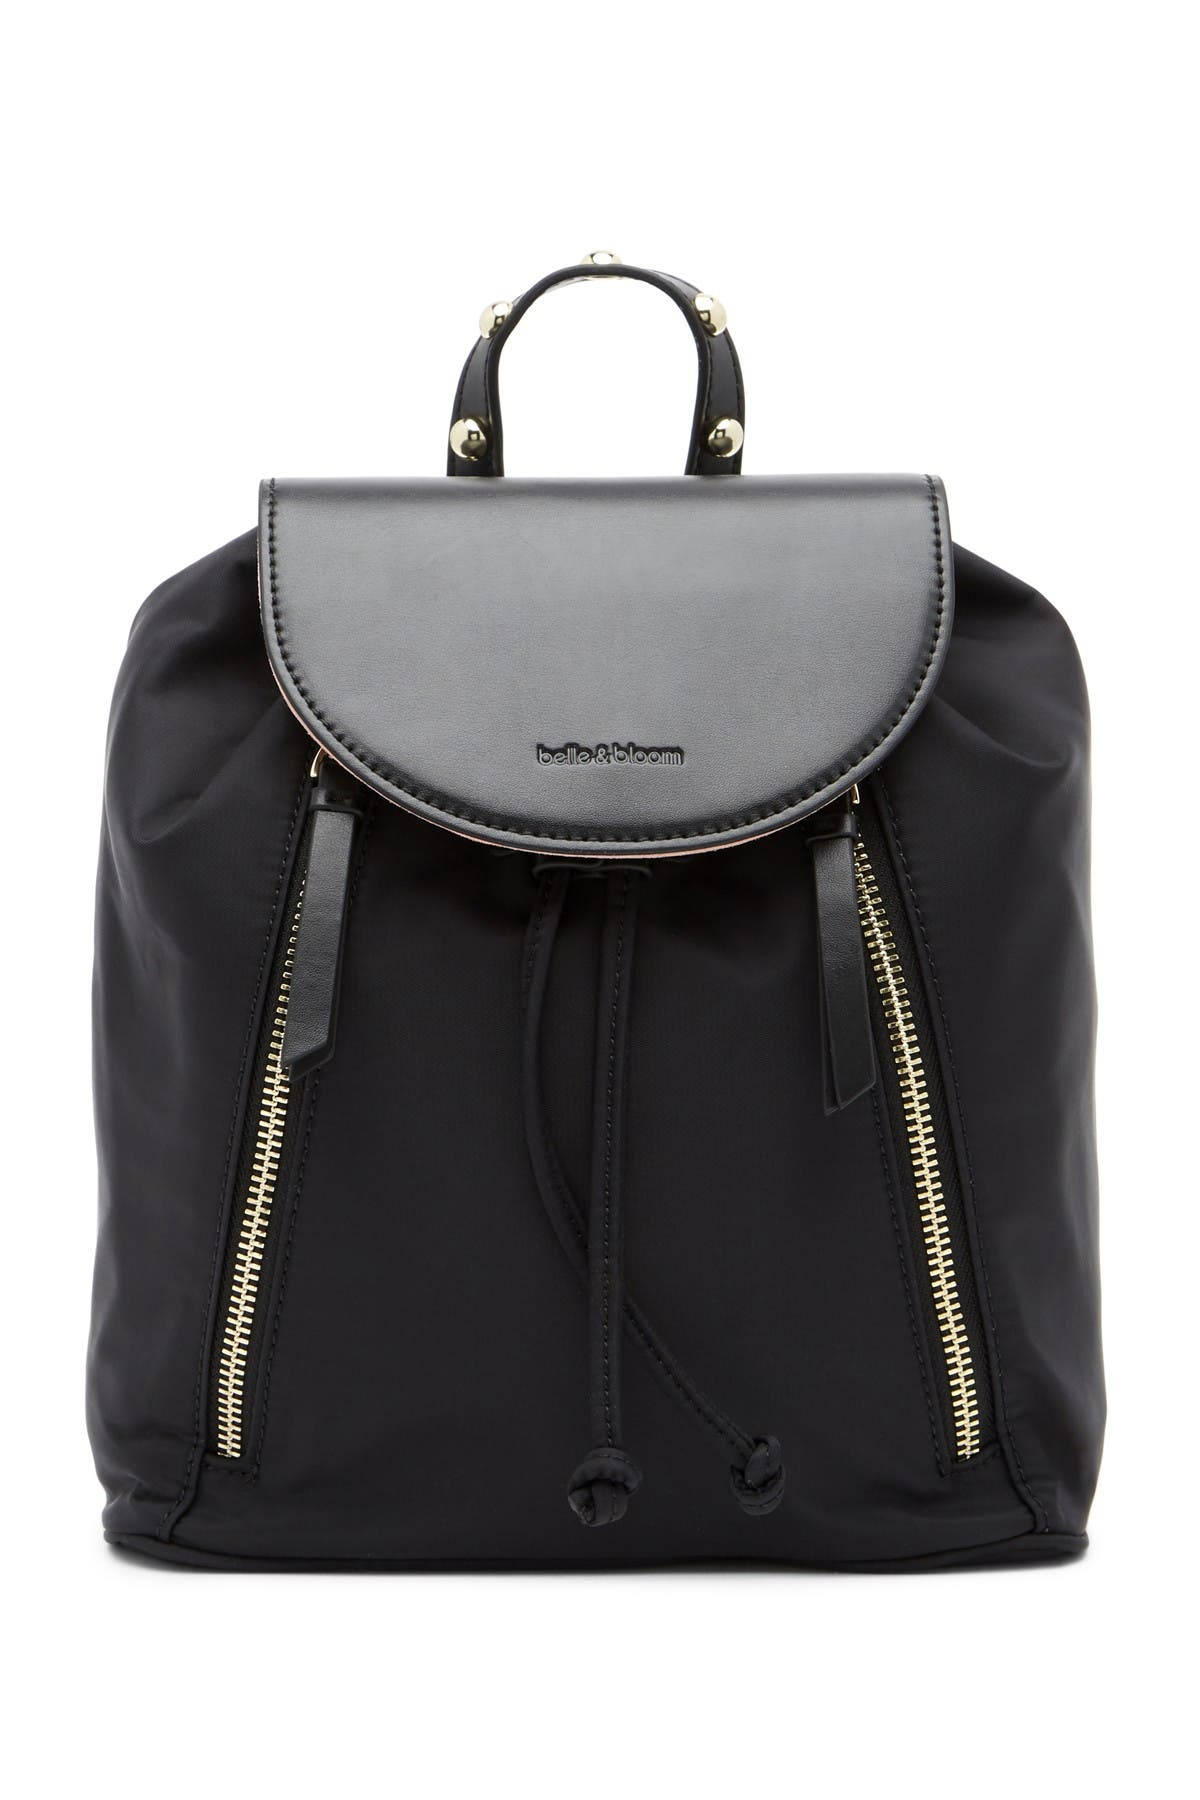 Image of Belle & Bloom Kenzo Nylon & Leather Backpack